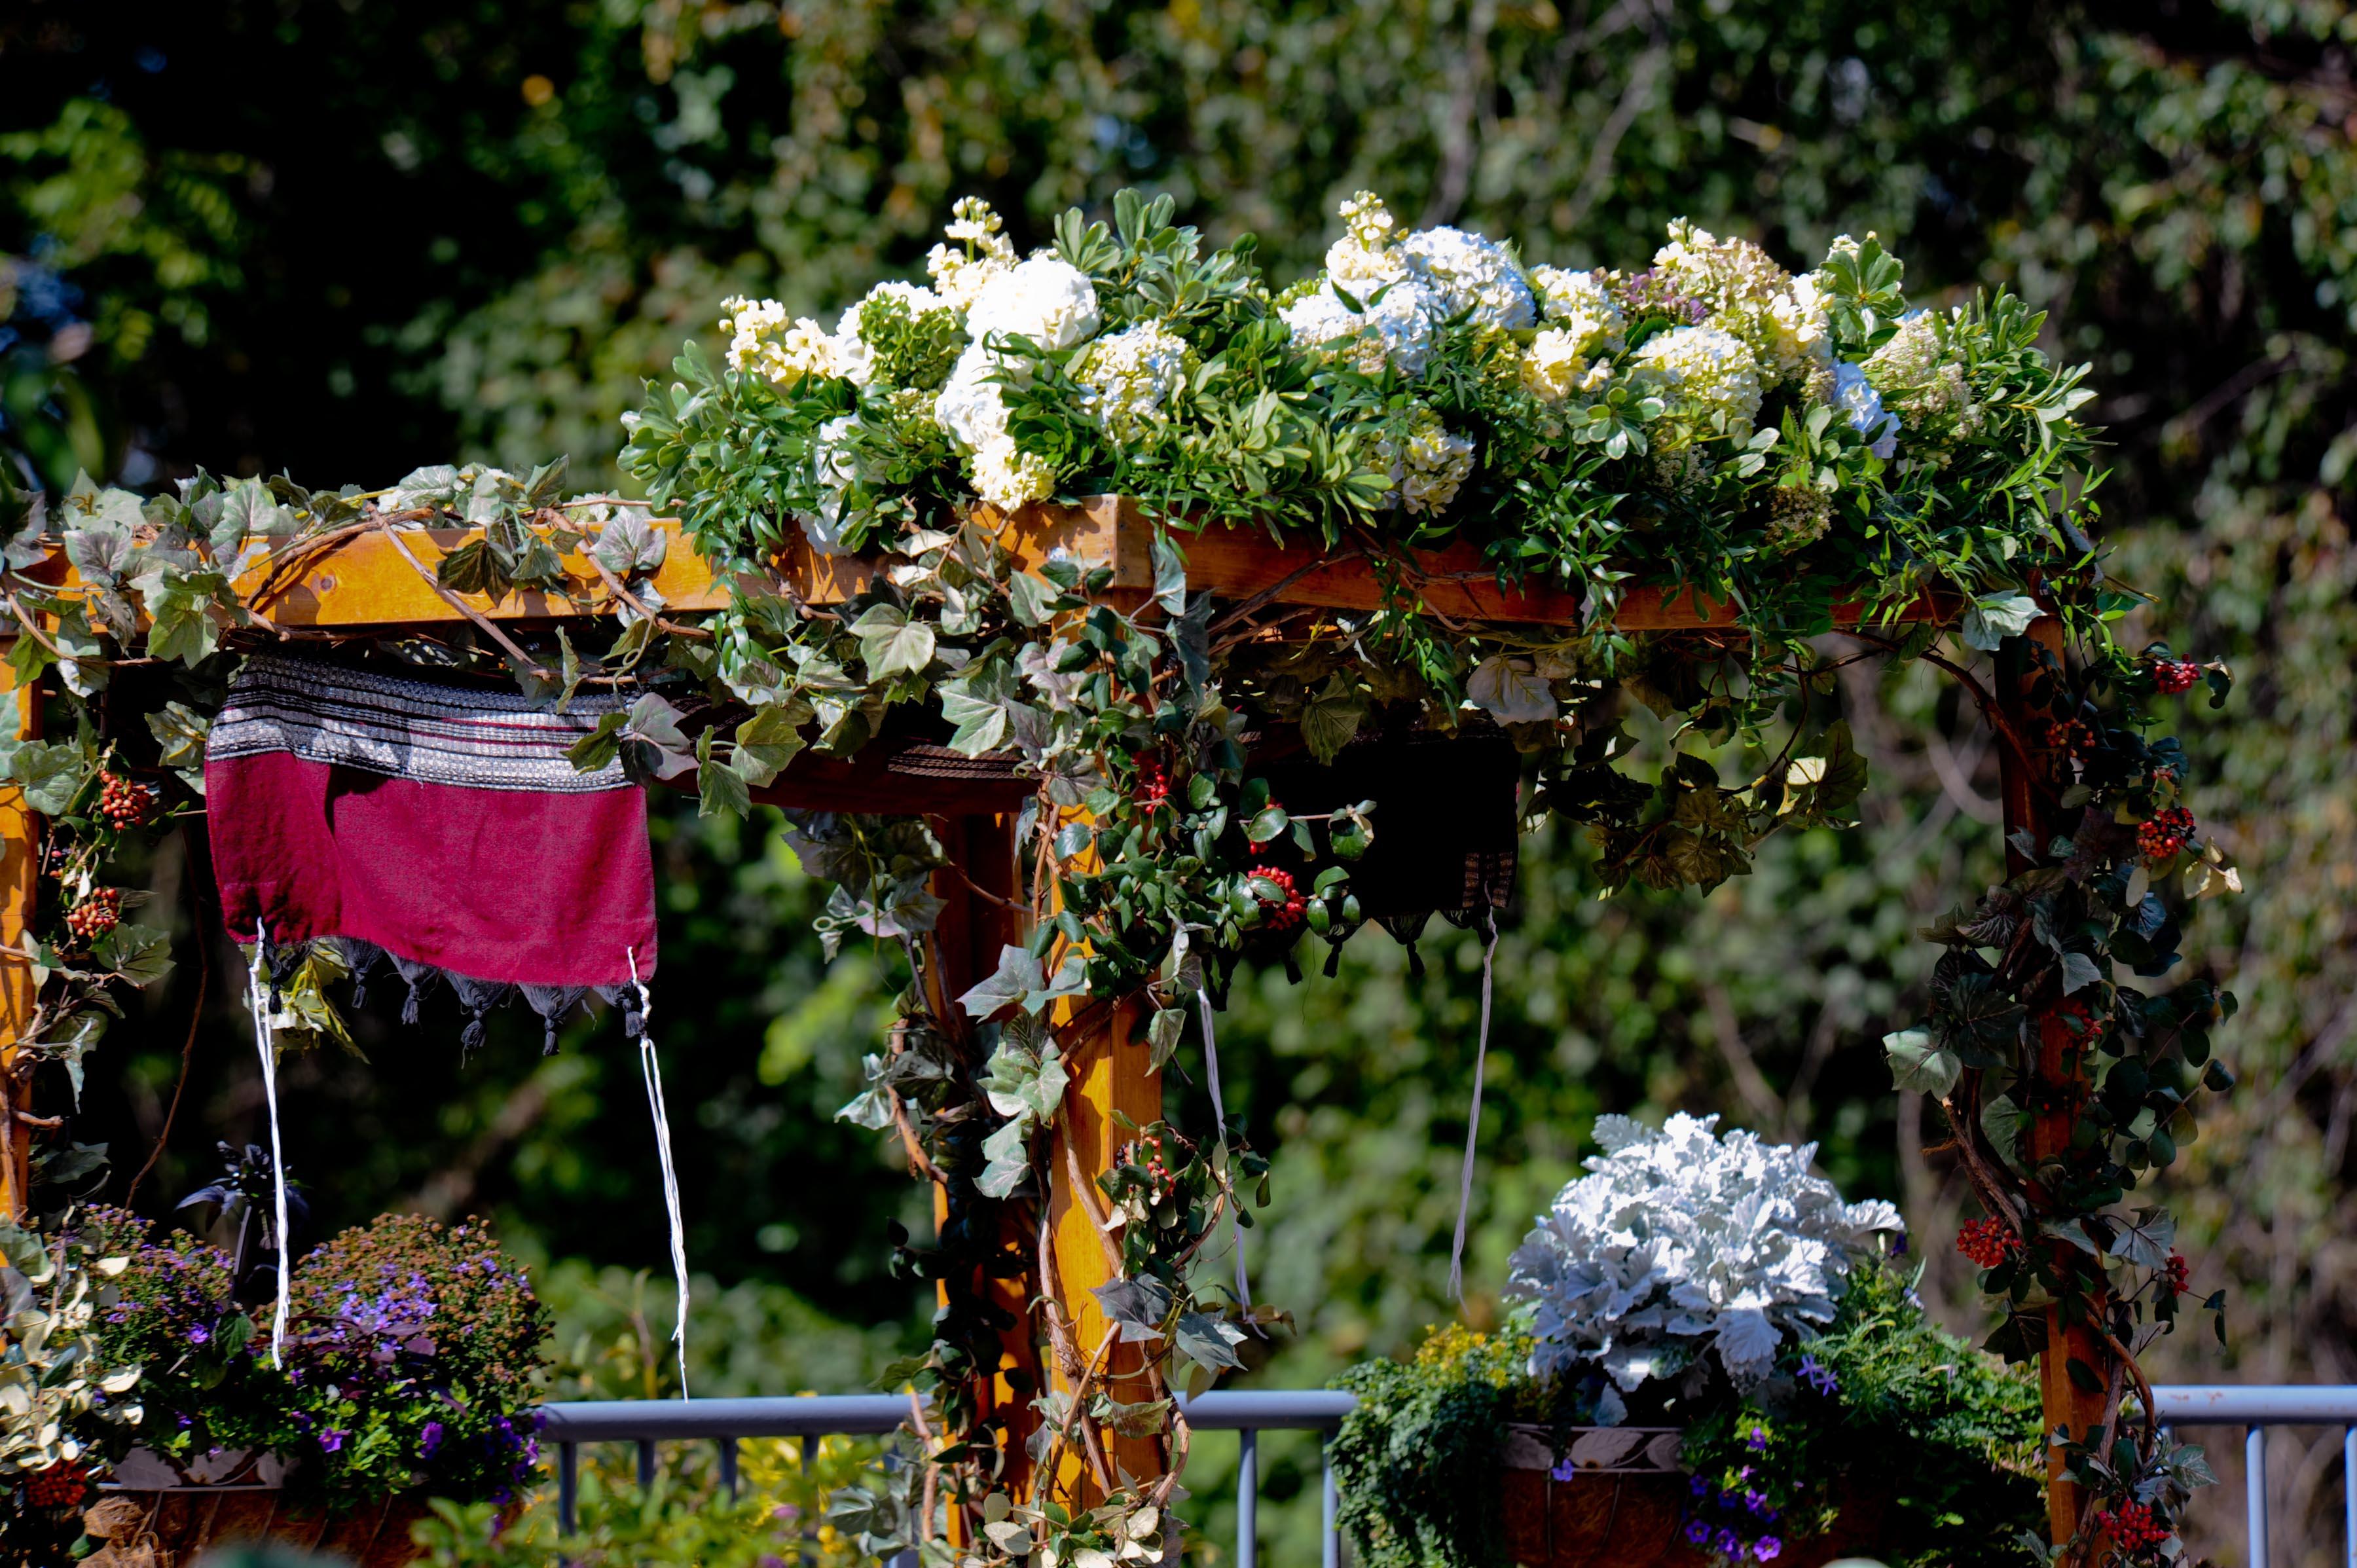 Fall jewish wedding at meadowlark botanical gardens - Meadowlark botanical gardens wedding ...